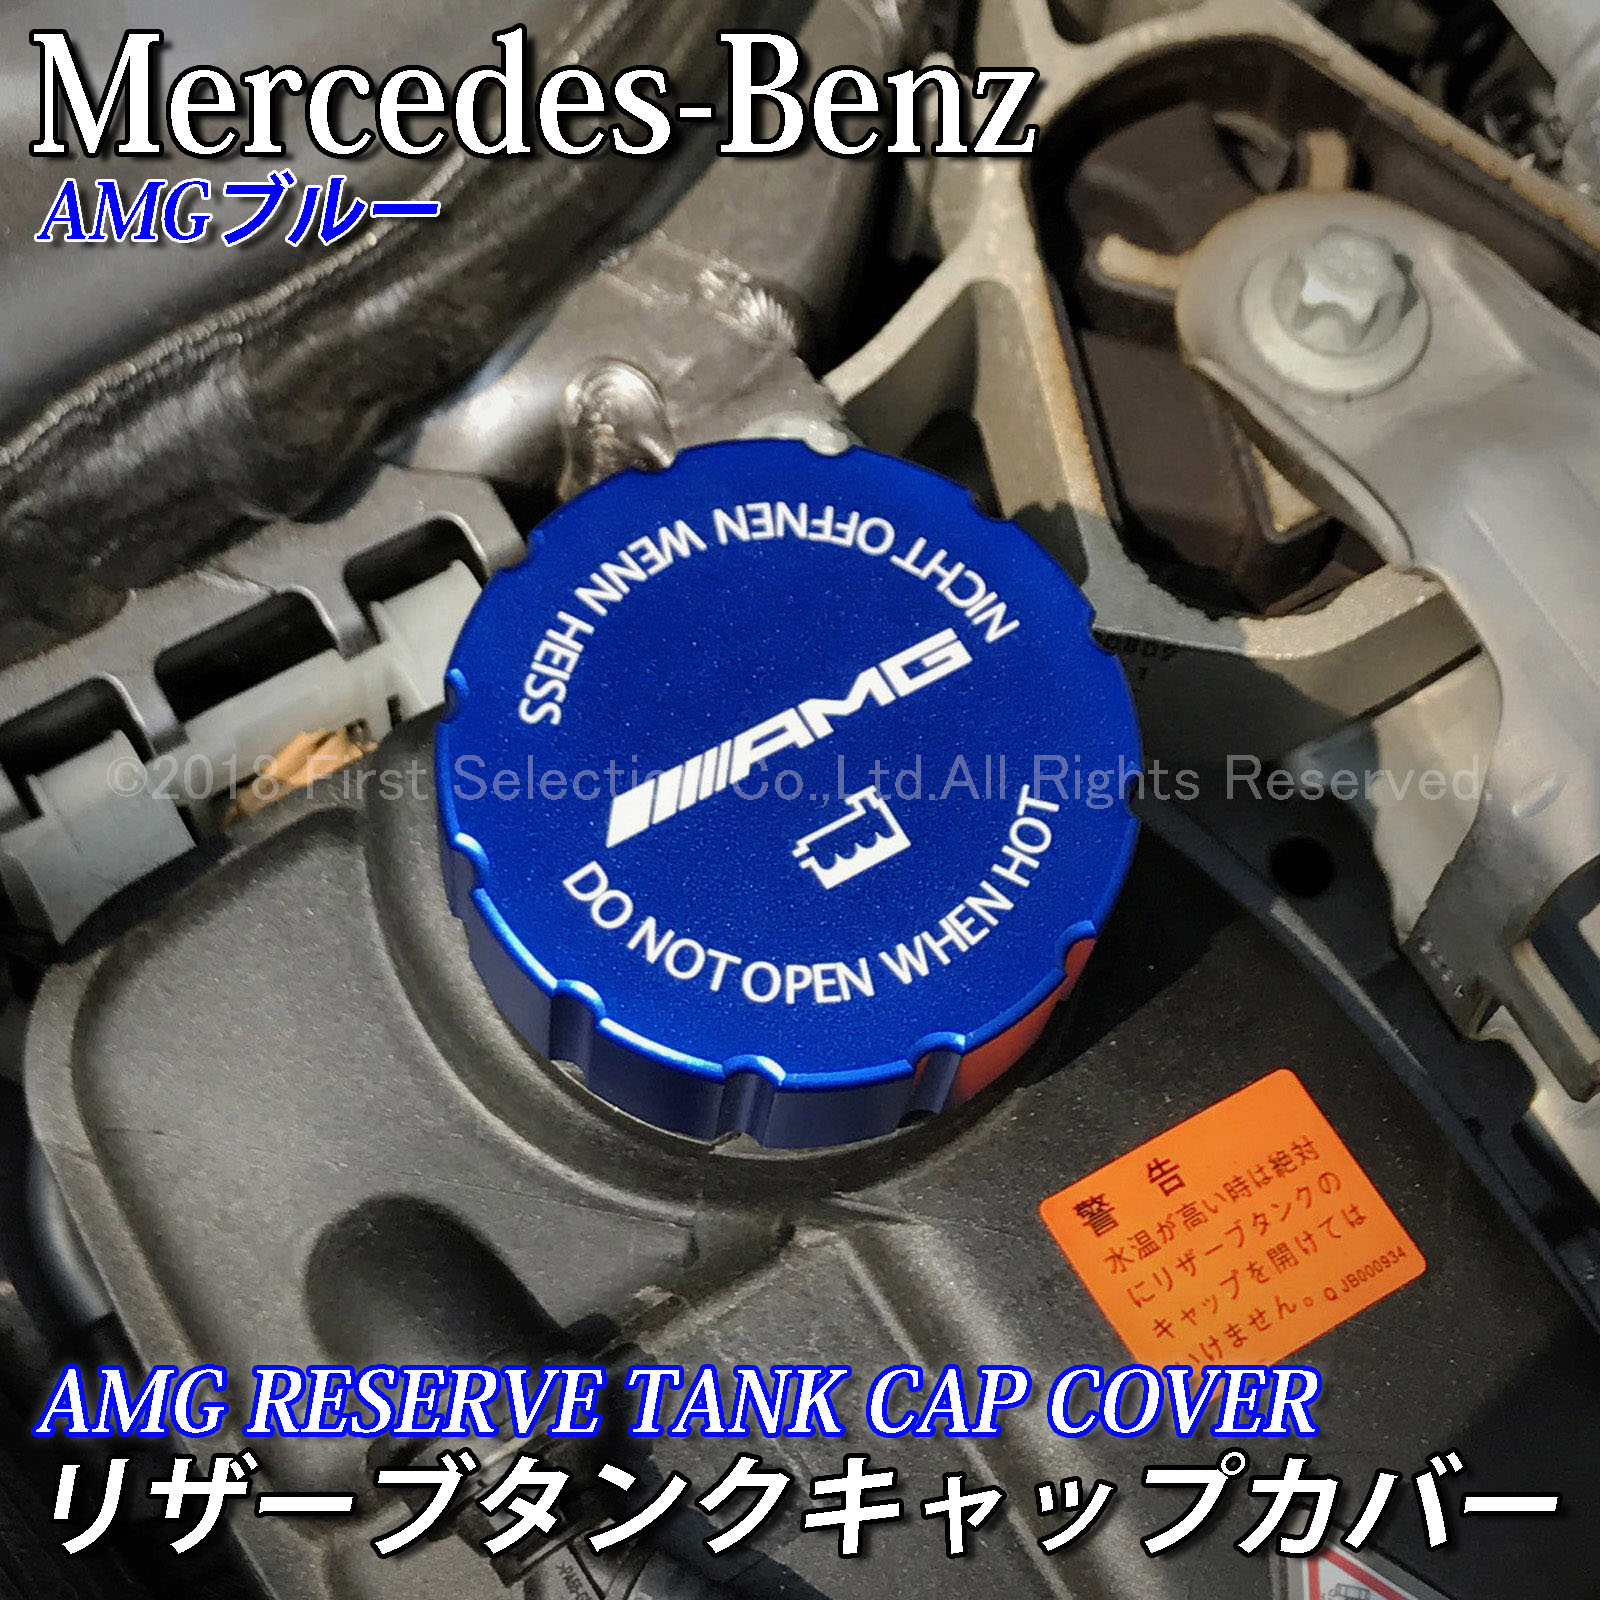 Mercedes-Benz ベンツ用 AMGロゴ 汎用リザーブタンクキャップカバー 青